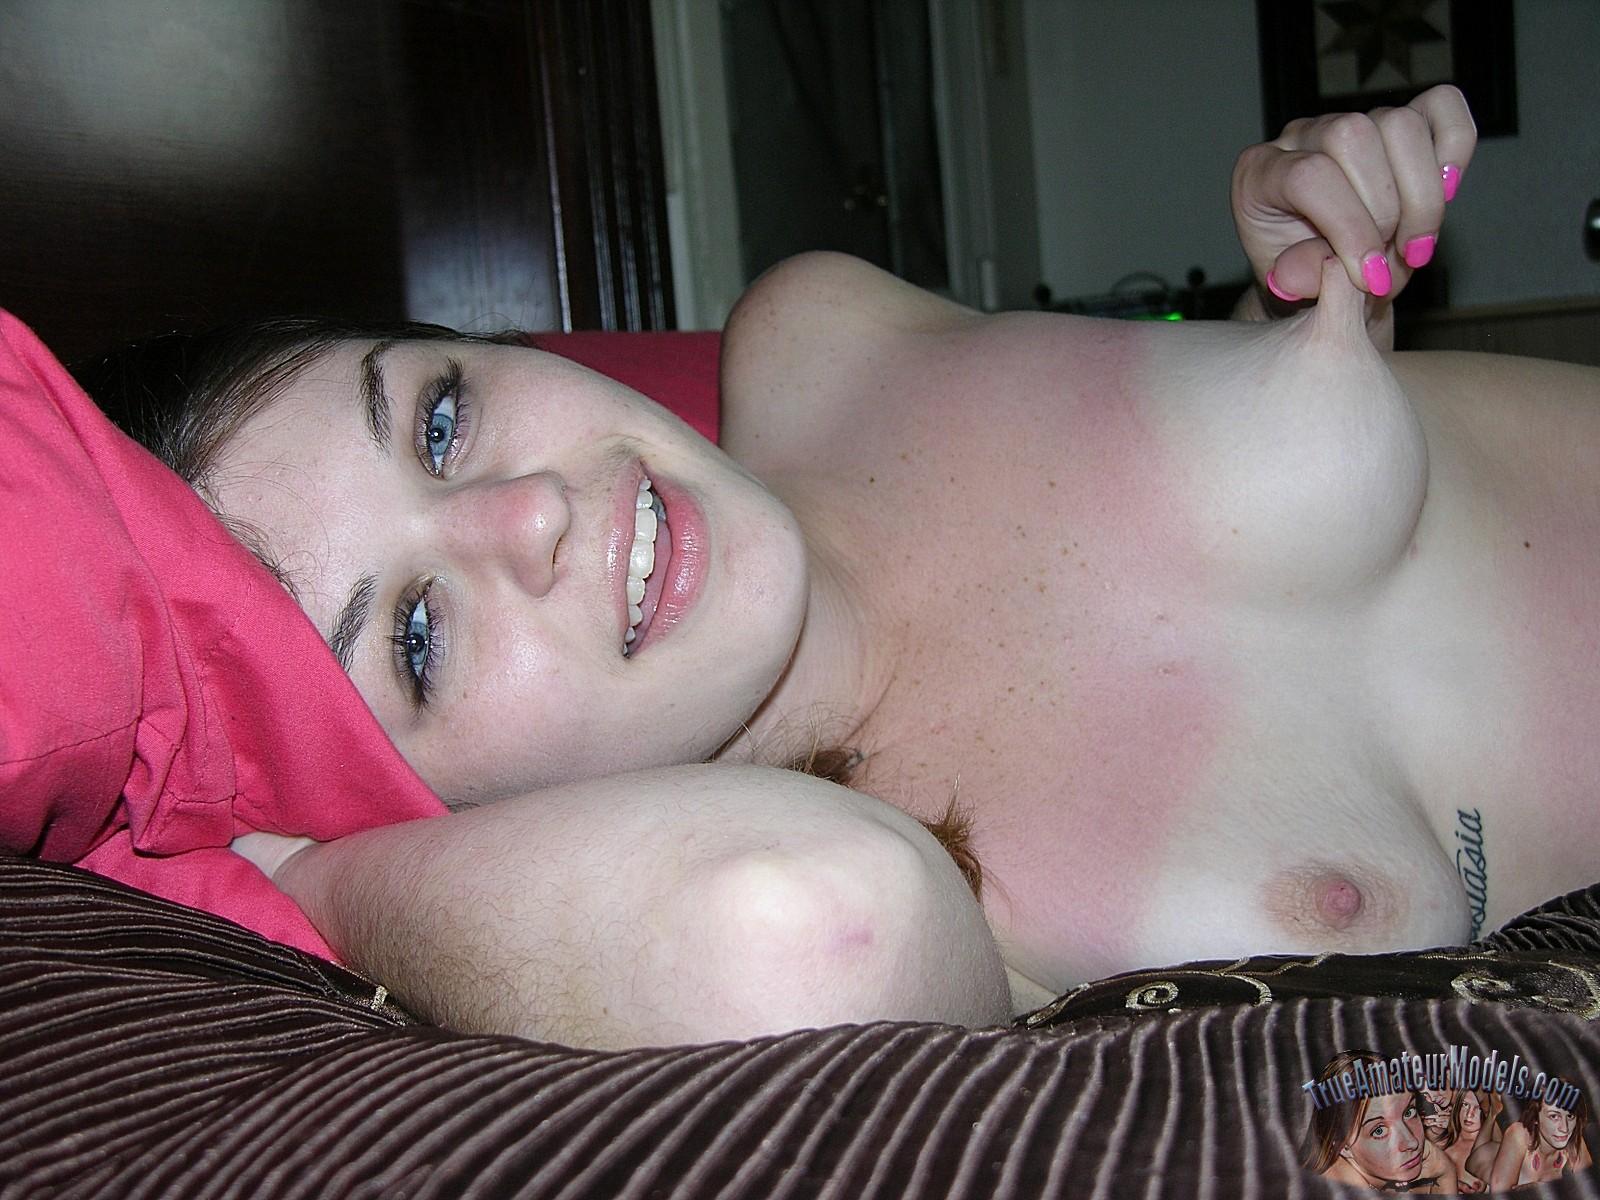 hairy-pussy-anastasia17